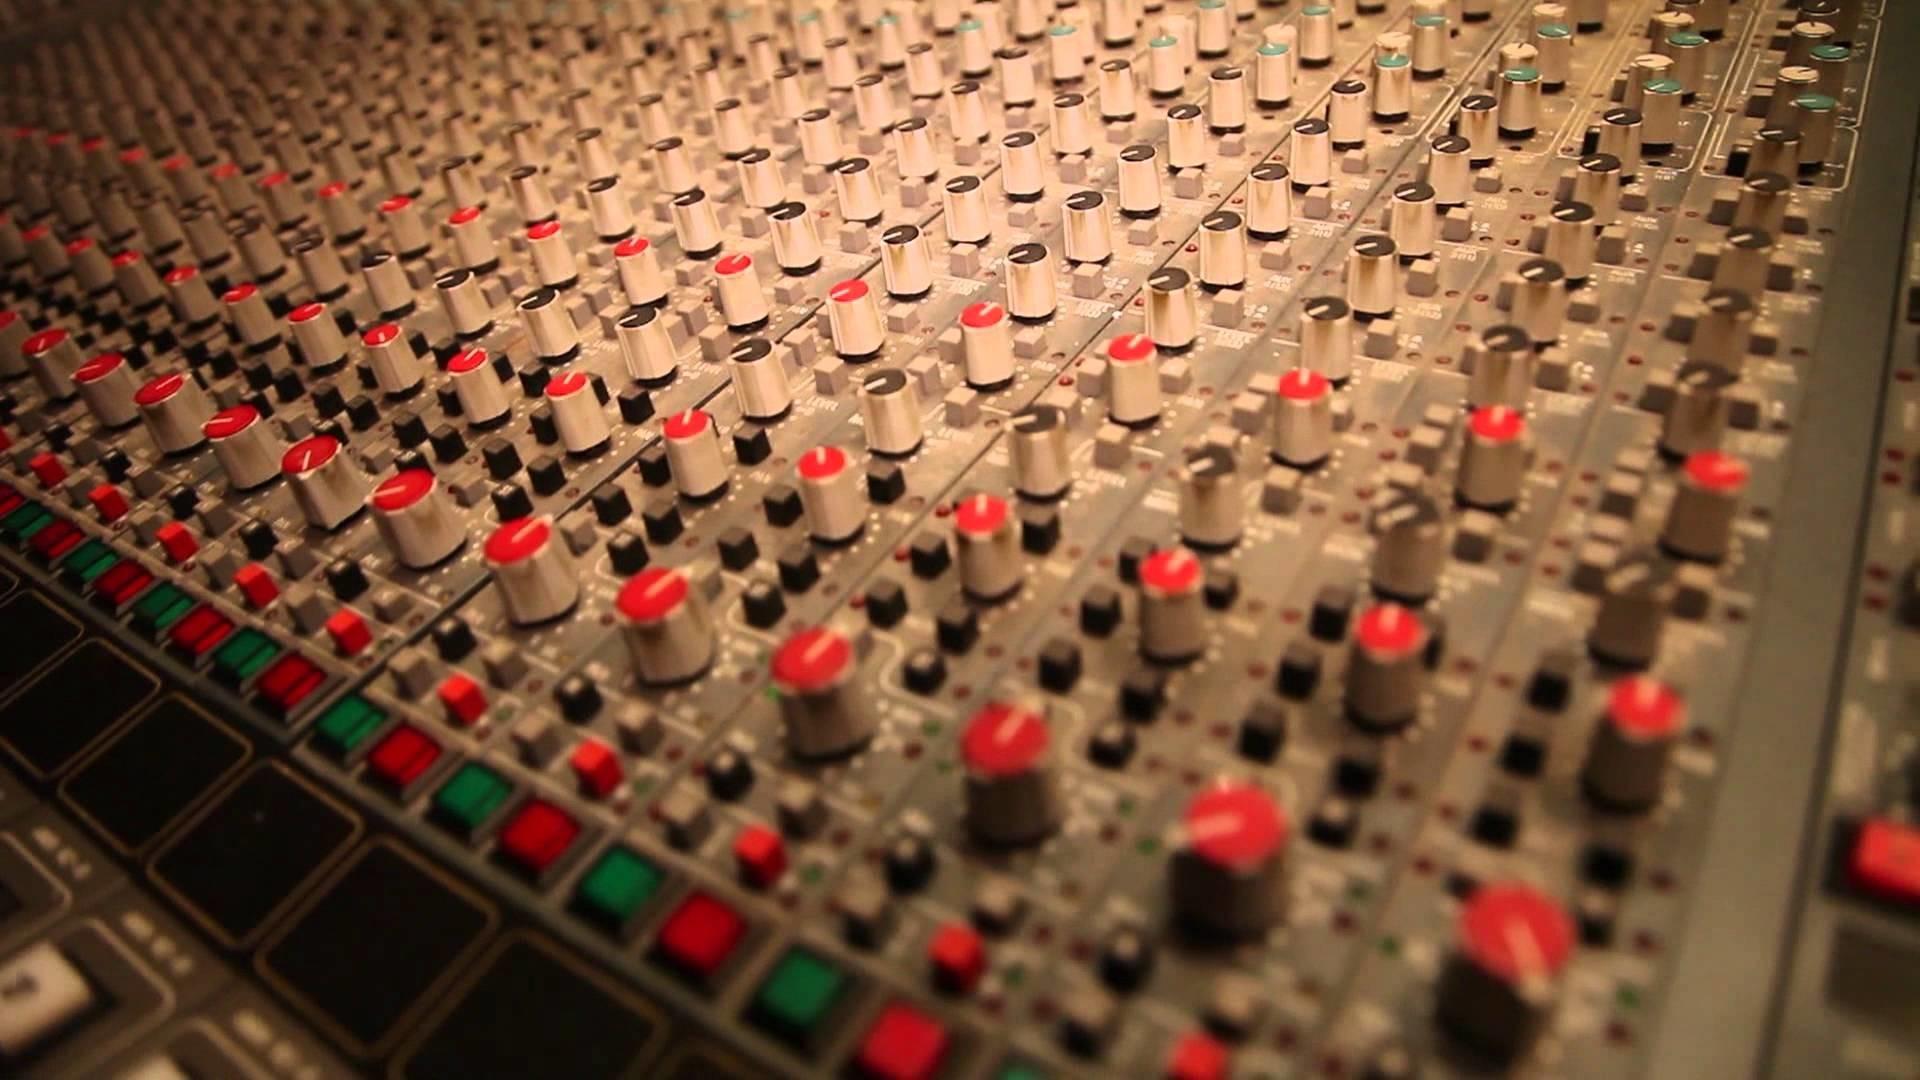 Music Studio 5 – Free Footage – Full HD 1080p